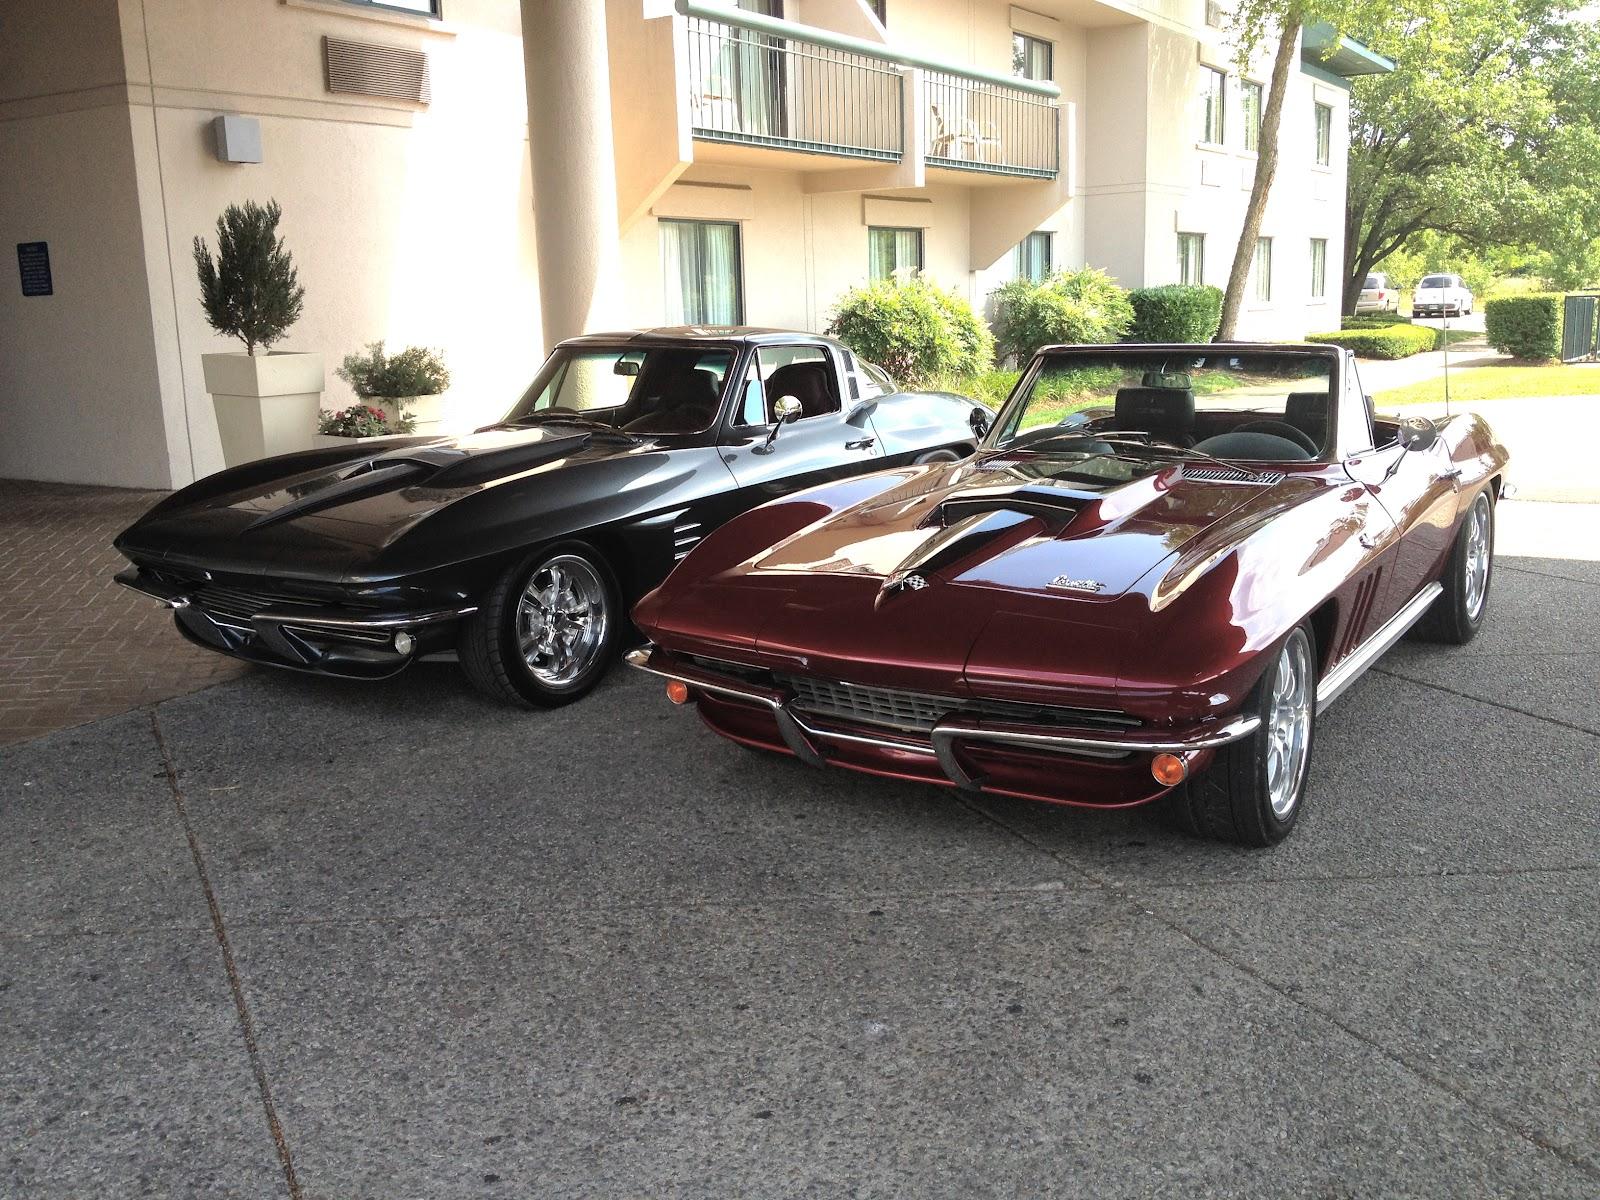 GoodGuys Nashville Larrys BRod Blog - Good guys car show nashville